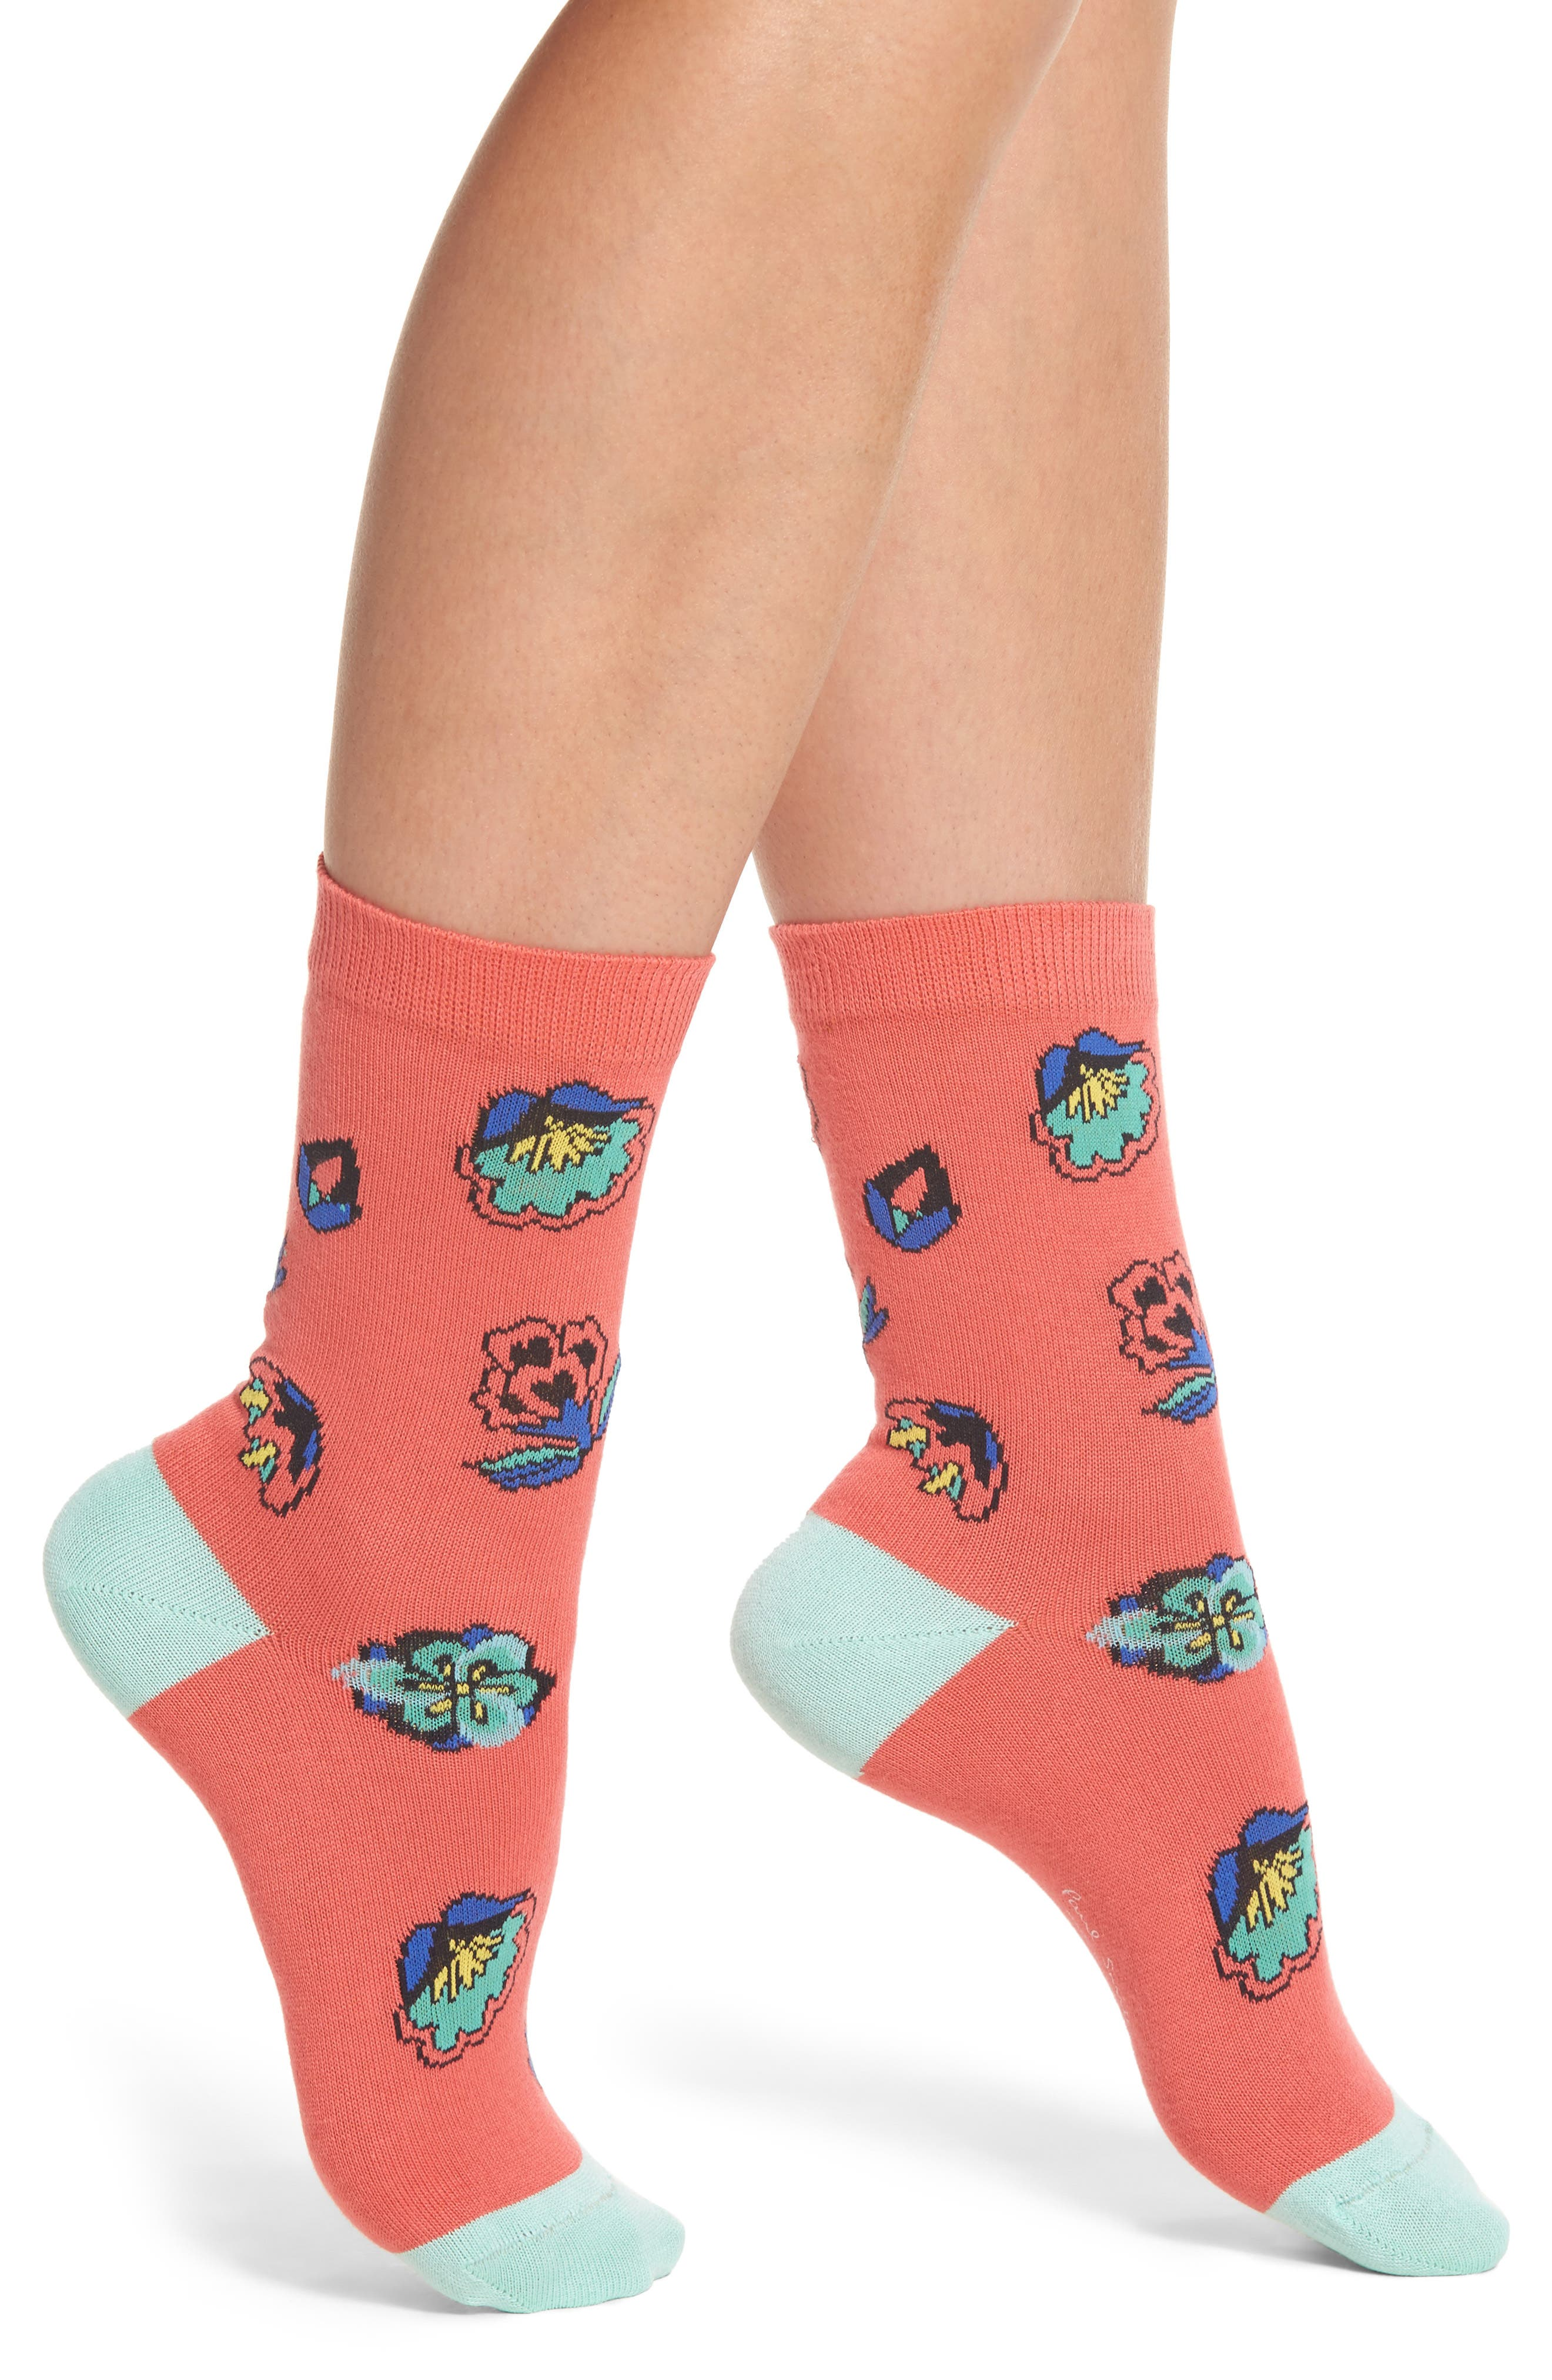 Eloise Kyoto Crew Socks,                             Main thumbnail 1, color,                             Coral